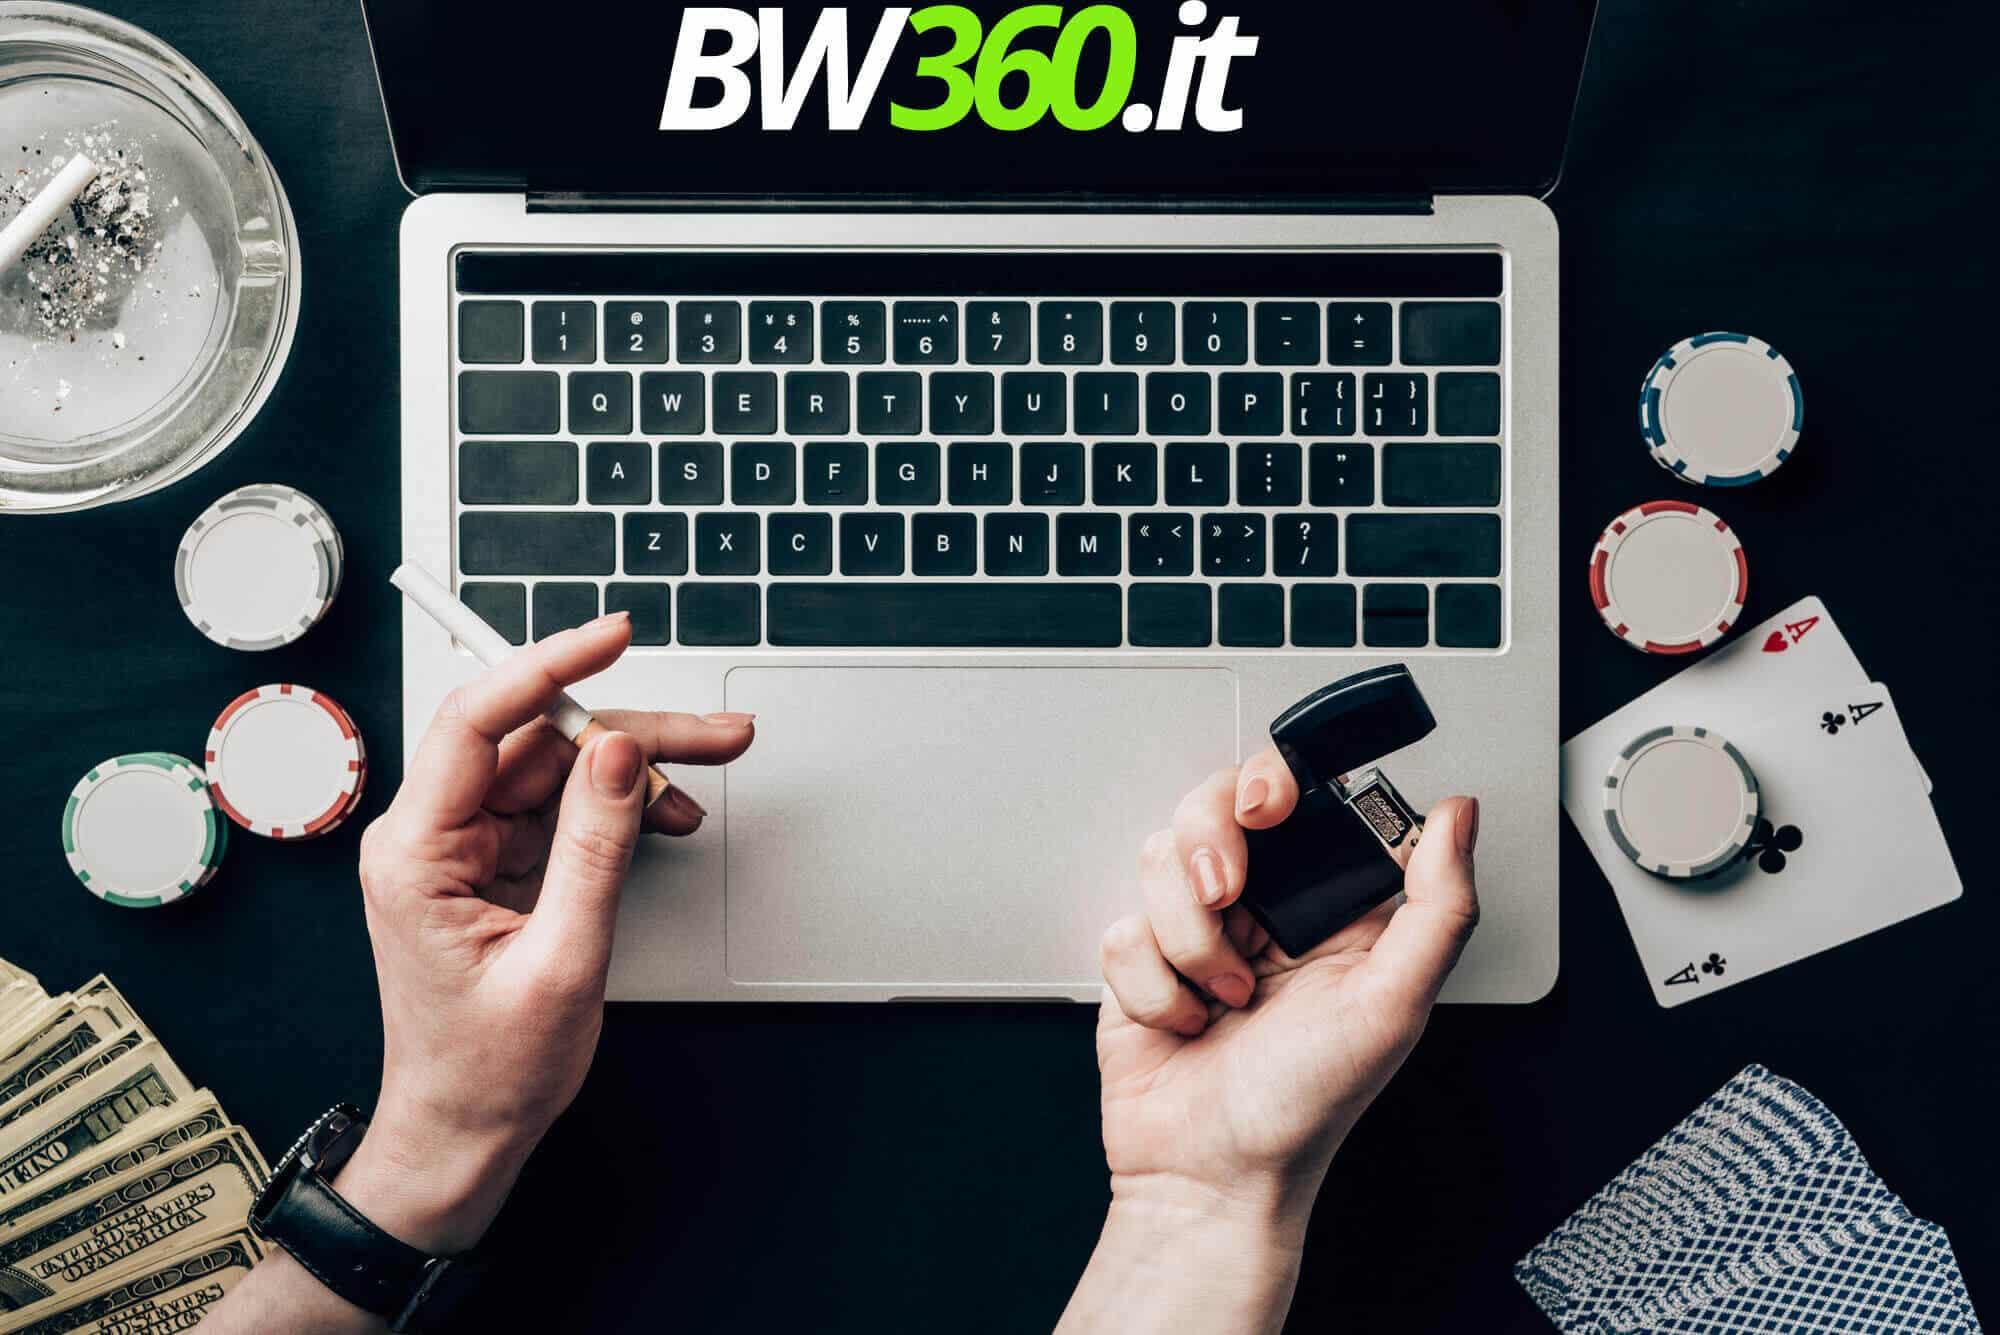 bw360 piattaforma poker